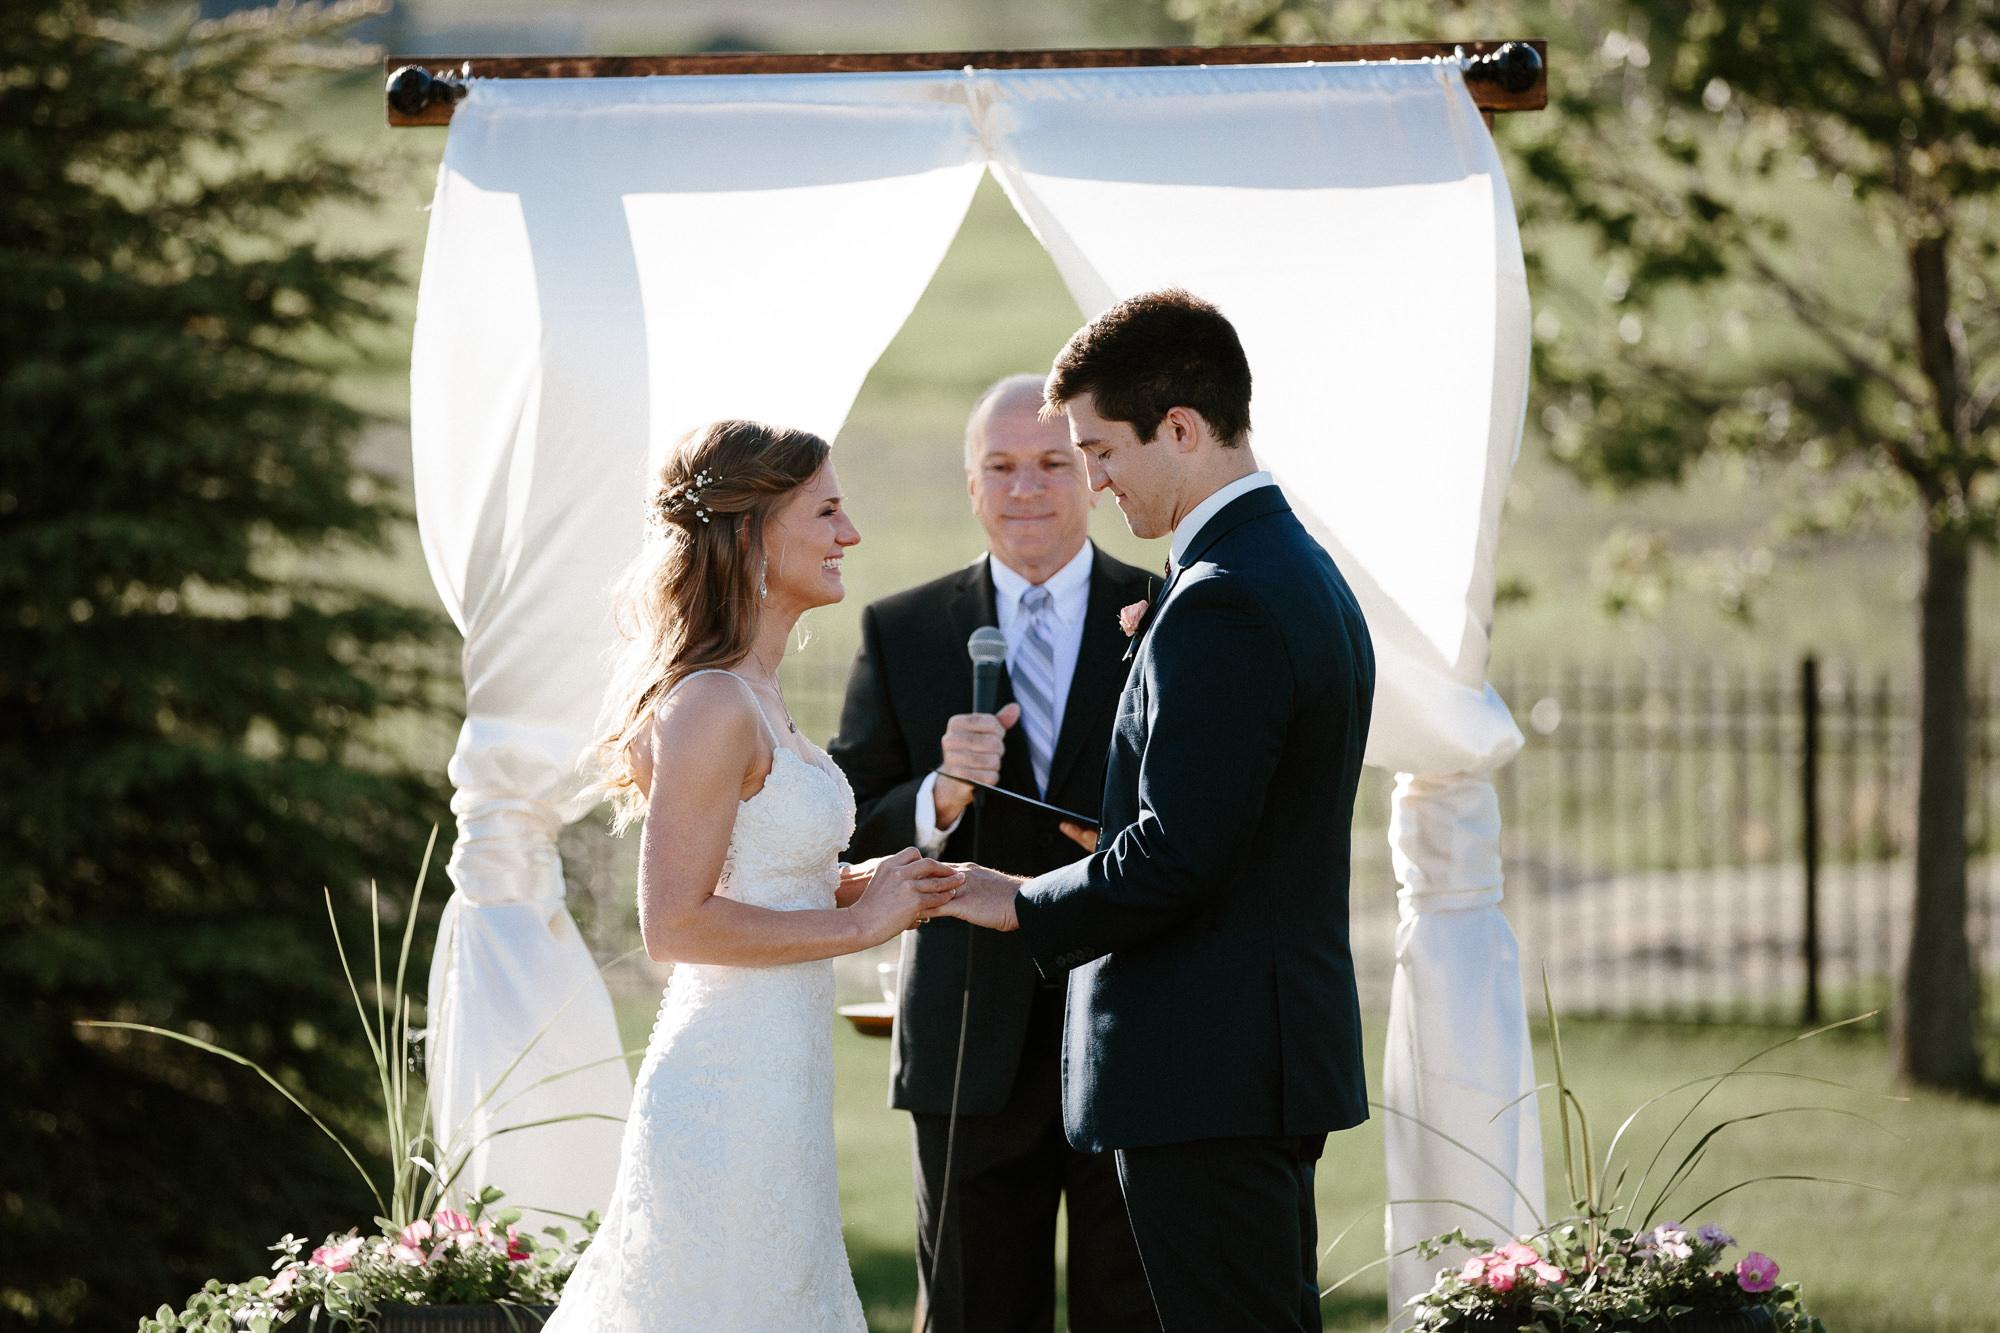 wedding-elopement-adventerous-romantic-timeless-south-dakota-blue-haven-barn-048.jpg